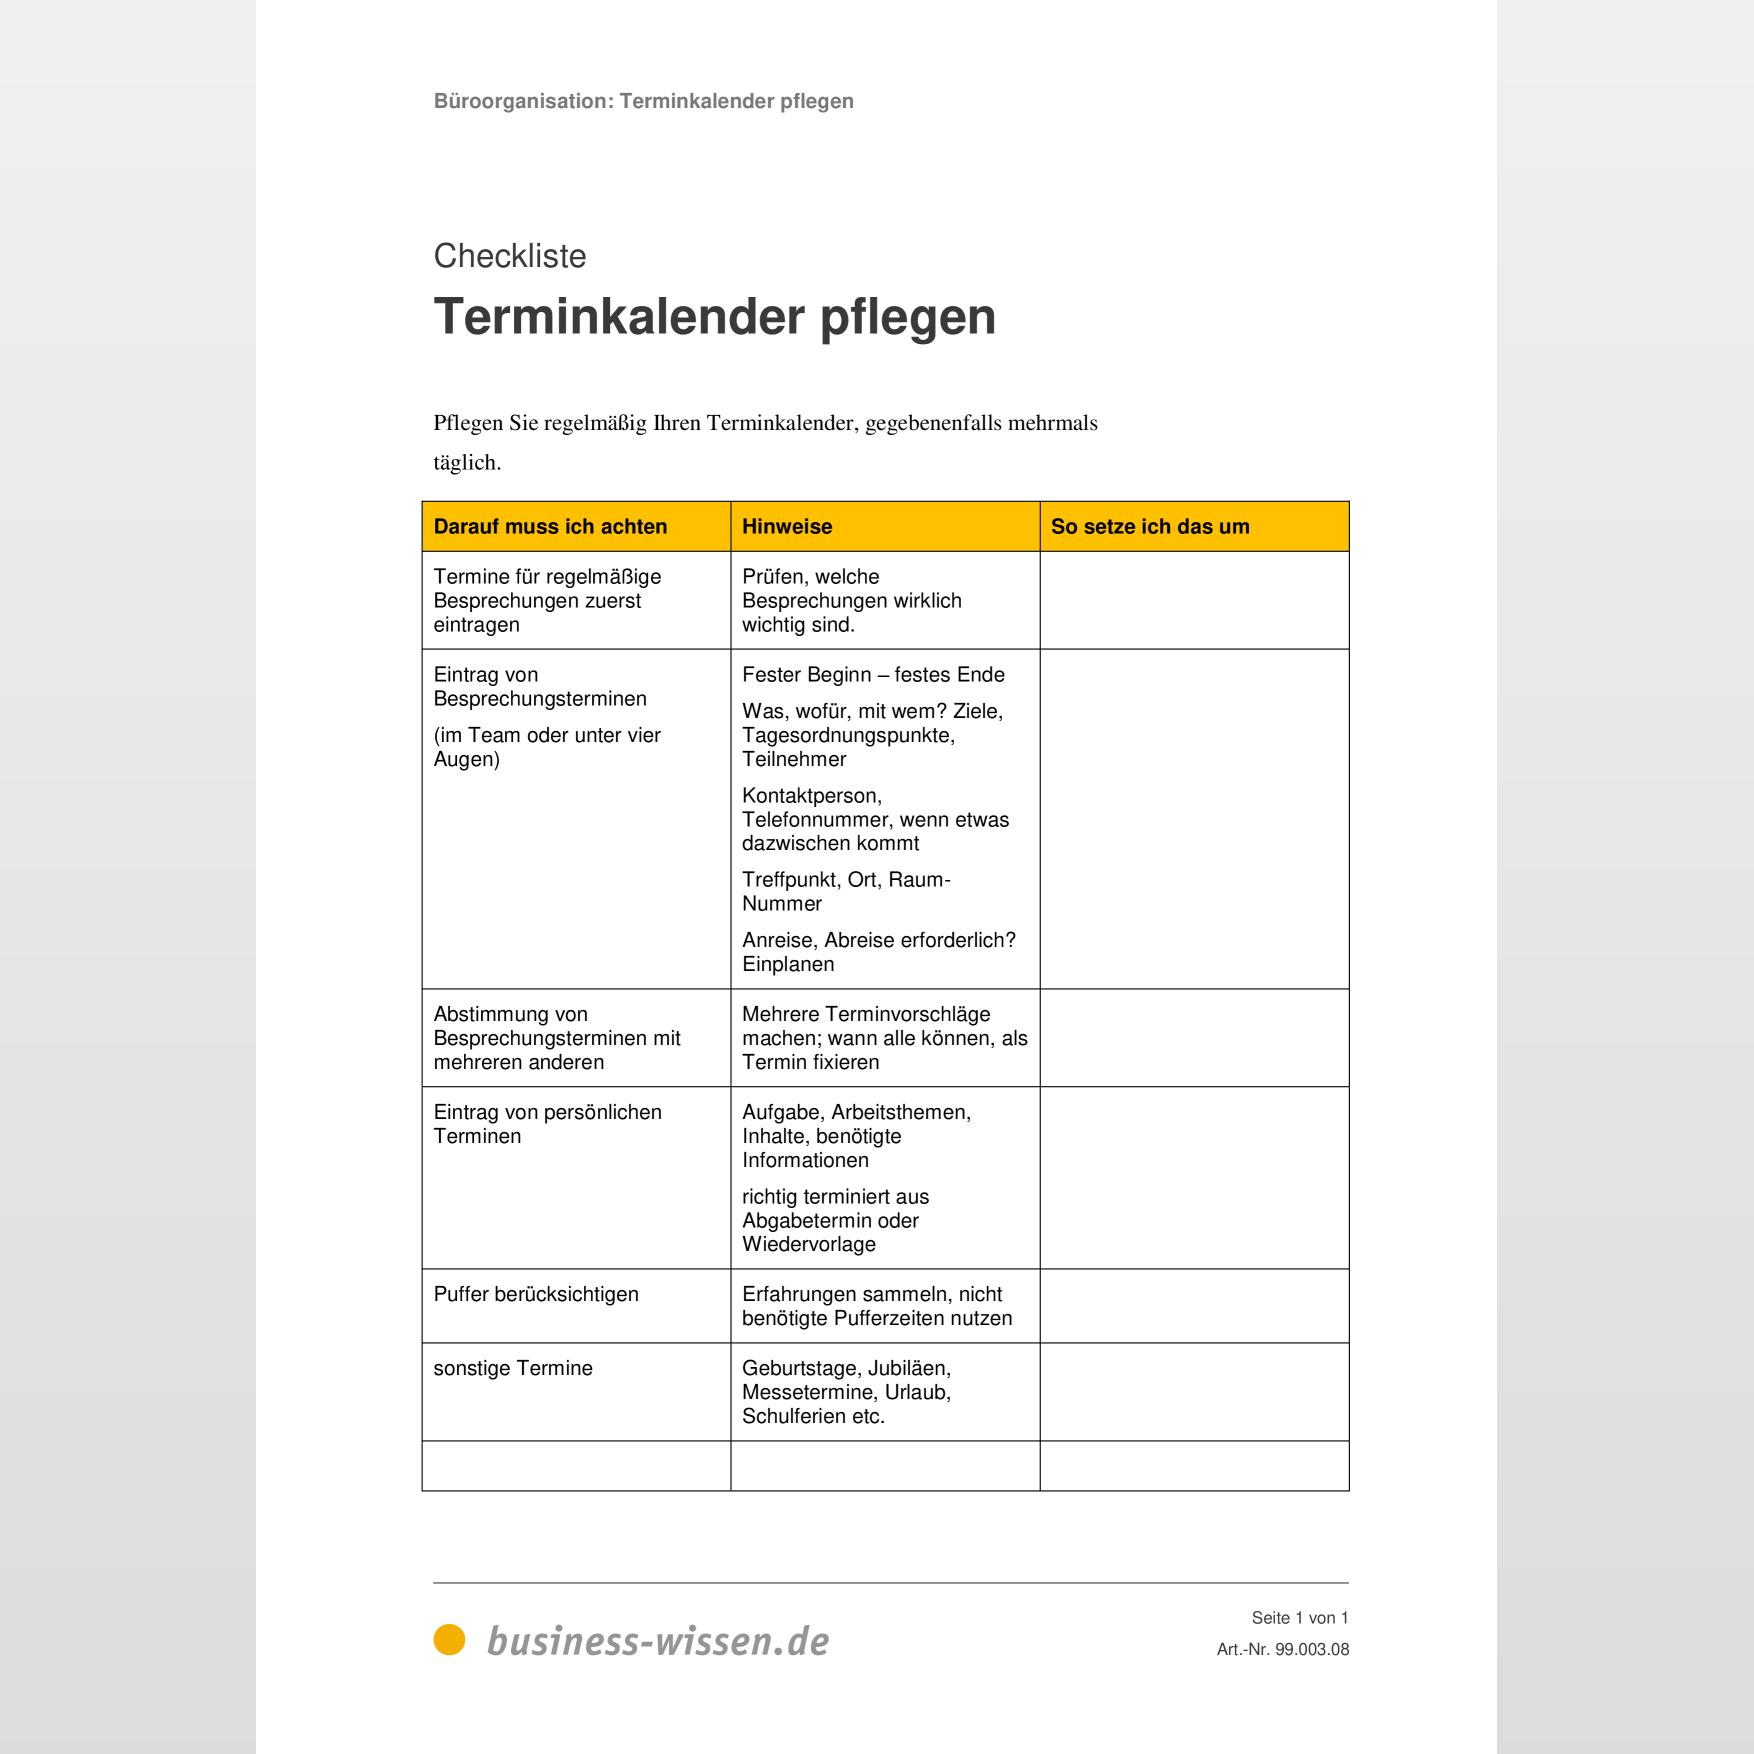 Terminkalender pflegen – Checkliste – business wissen.de